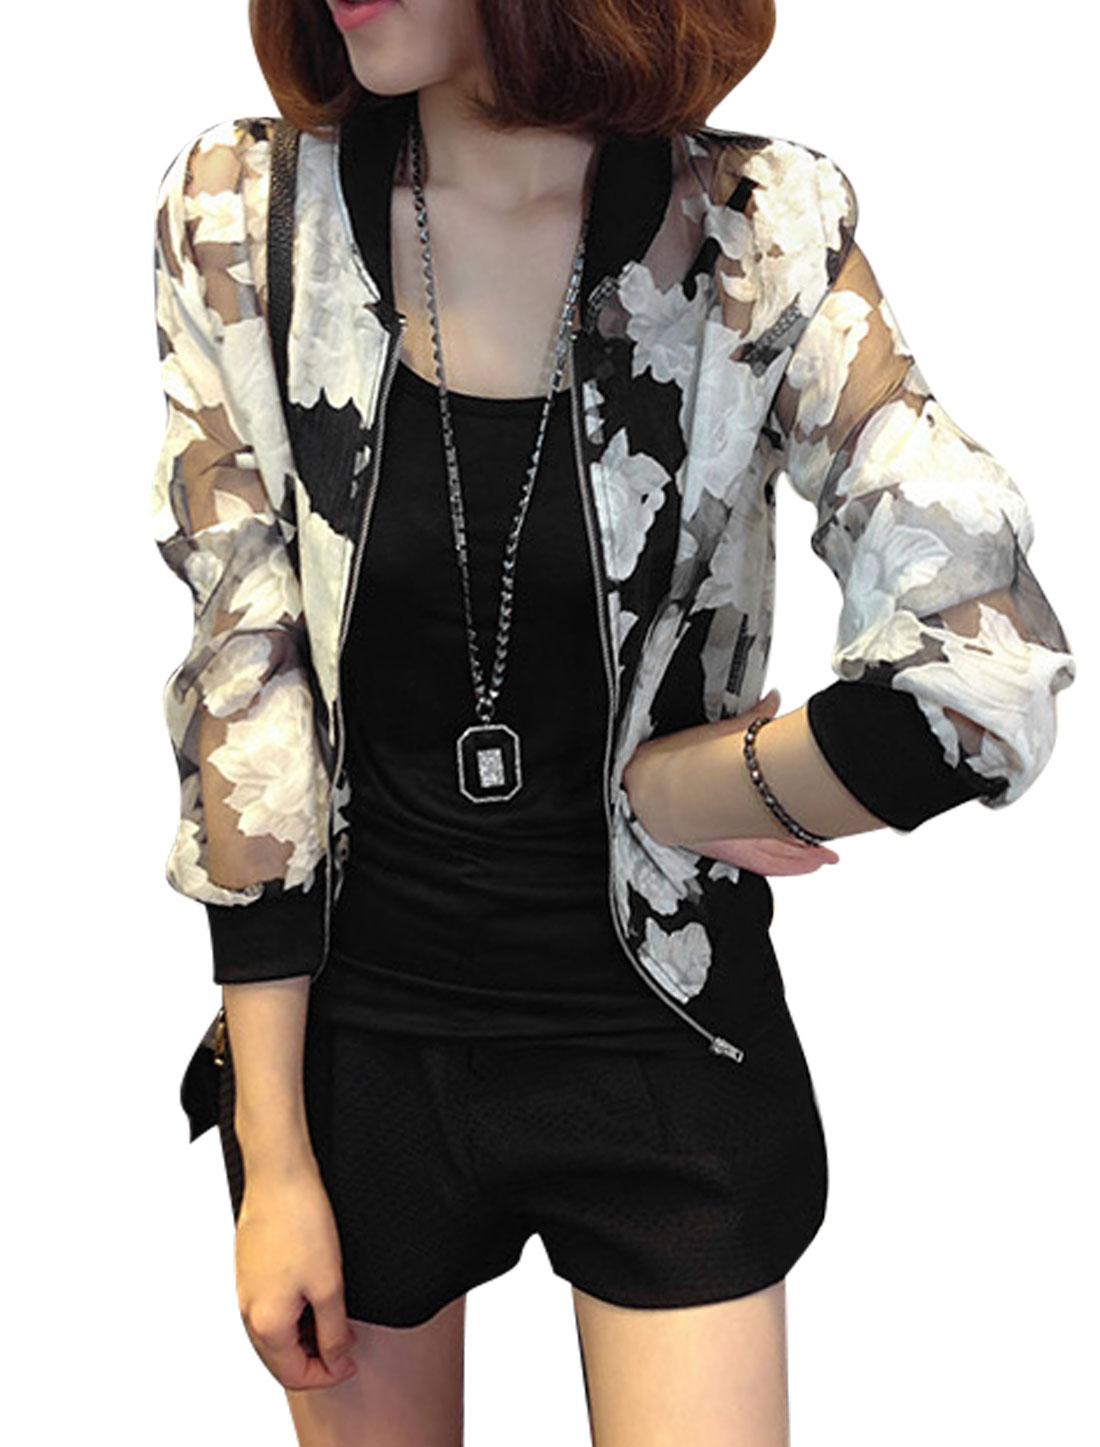 Women Stand Collar Floral Prints Semi Sheer Organza Jacket Black White XS